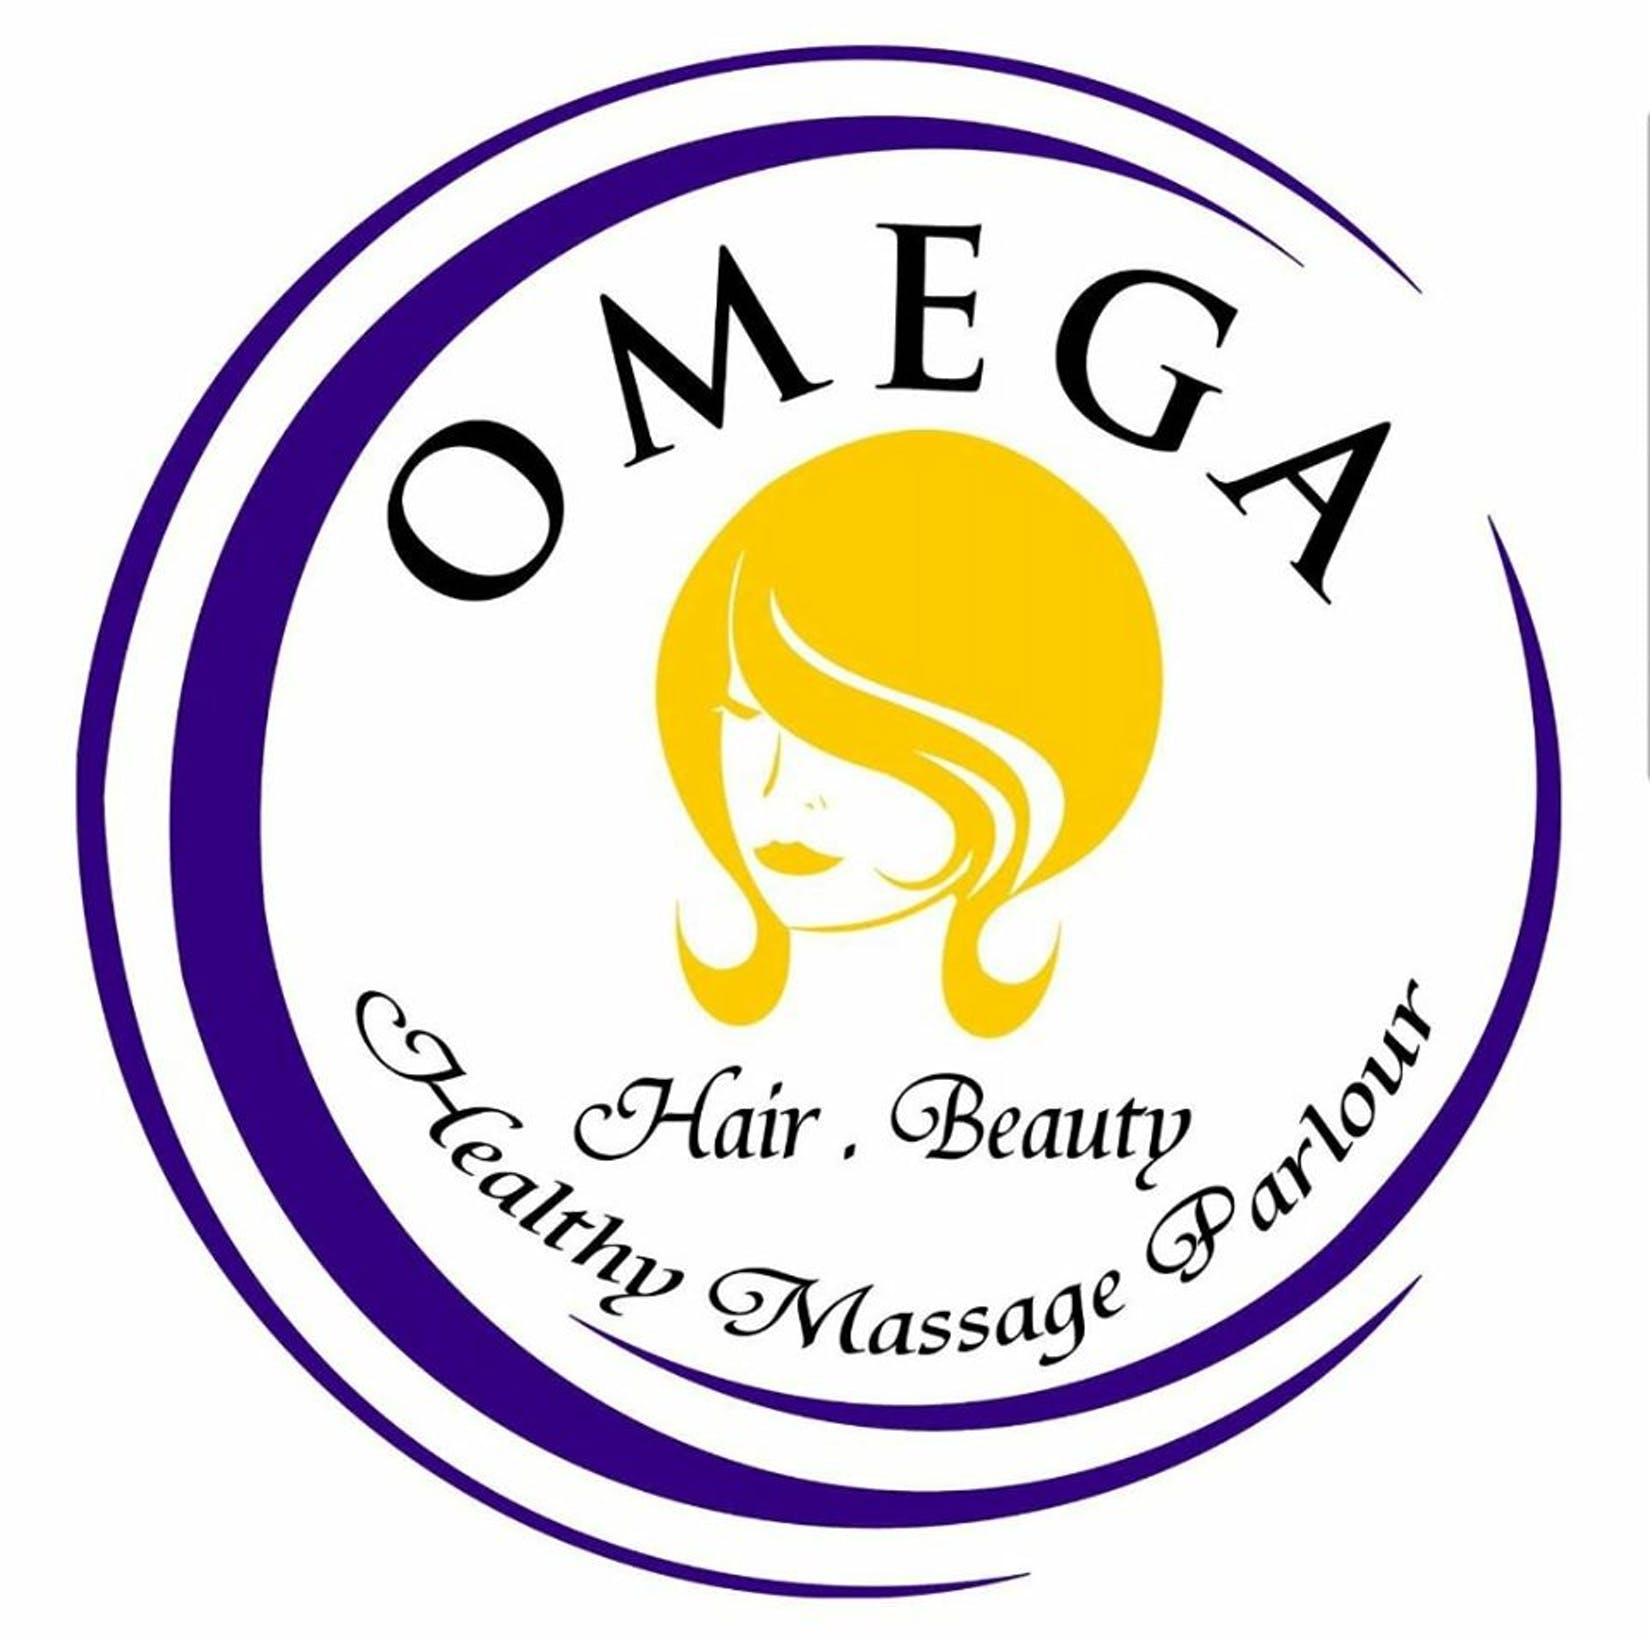 Omega Hair, Beauty & Health-Ahlone | Beauty